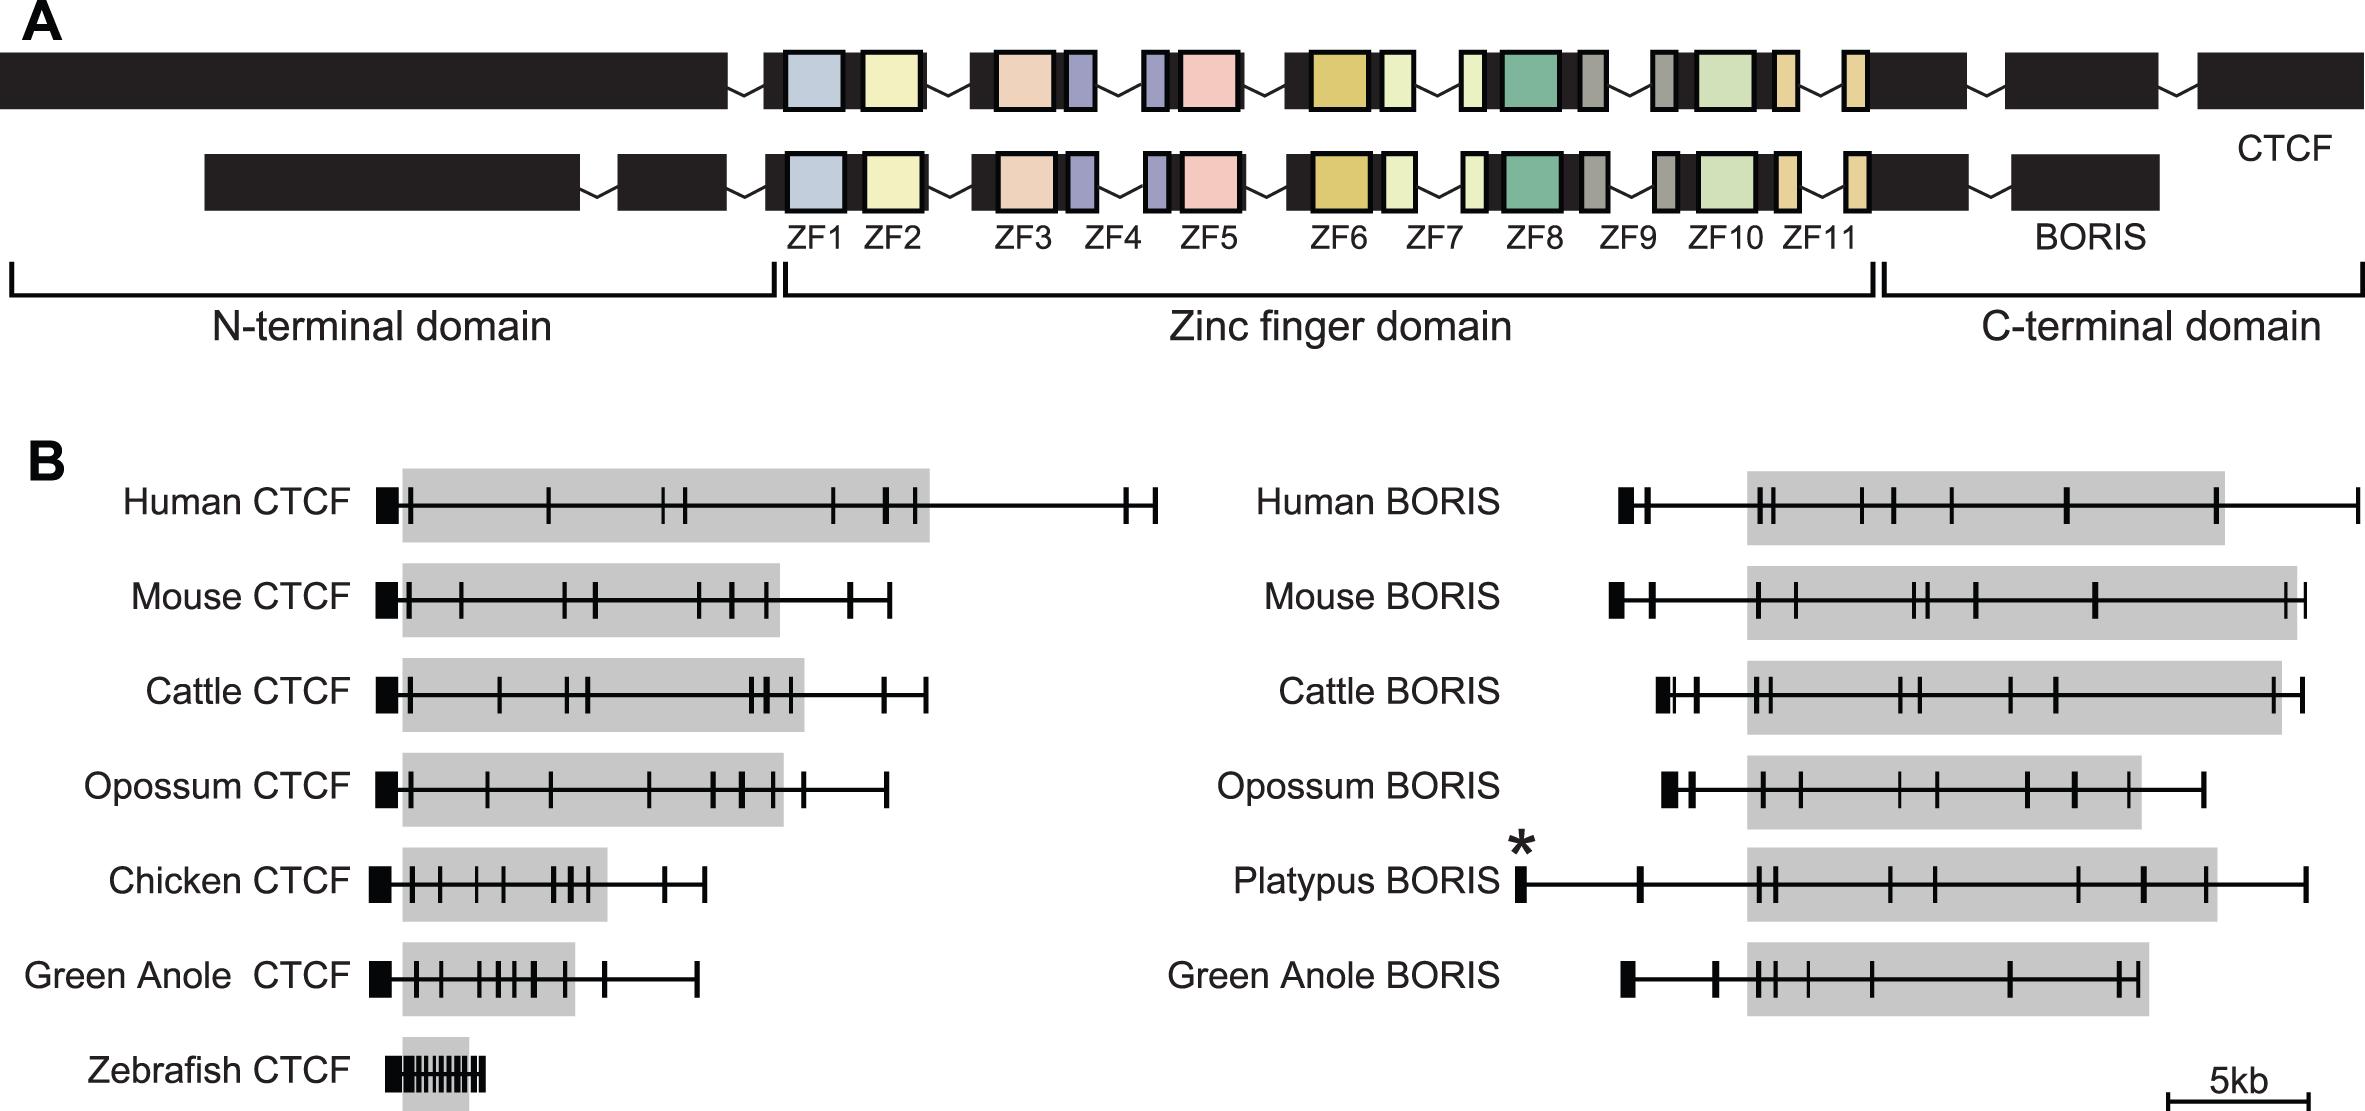 Gene structure of <i>CTCF</i> and <i>BORIS</i>.